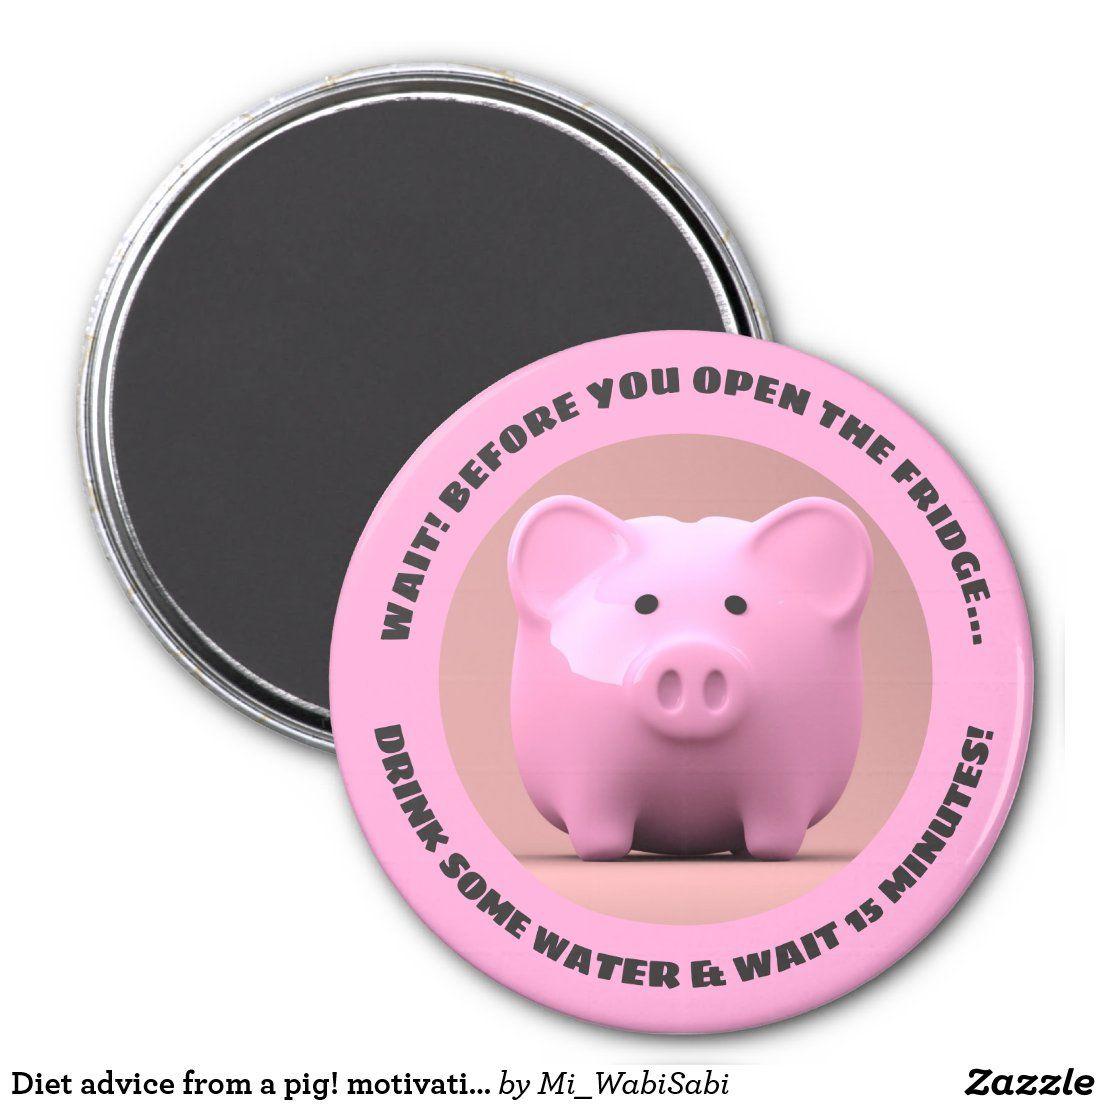 Diet Advice From A Pig Motivational Magnet Zazzle Com Diet Advice Diet Motivation